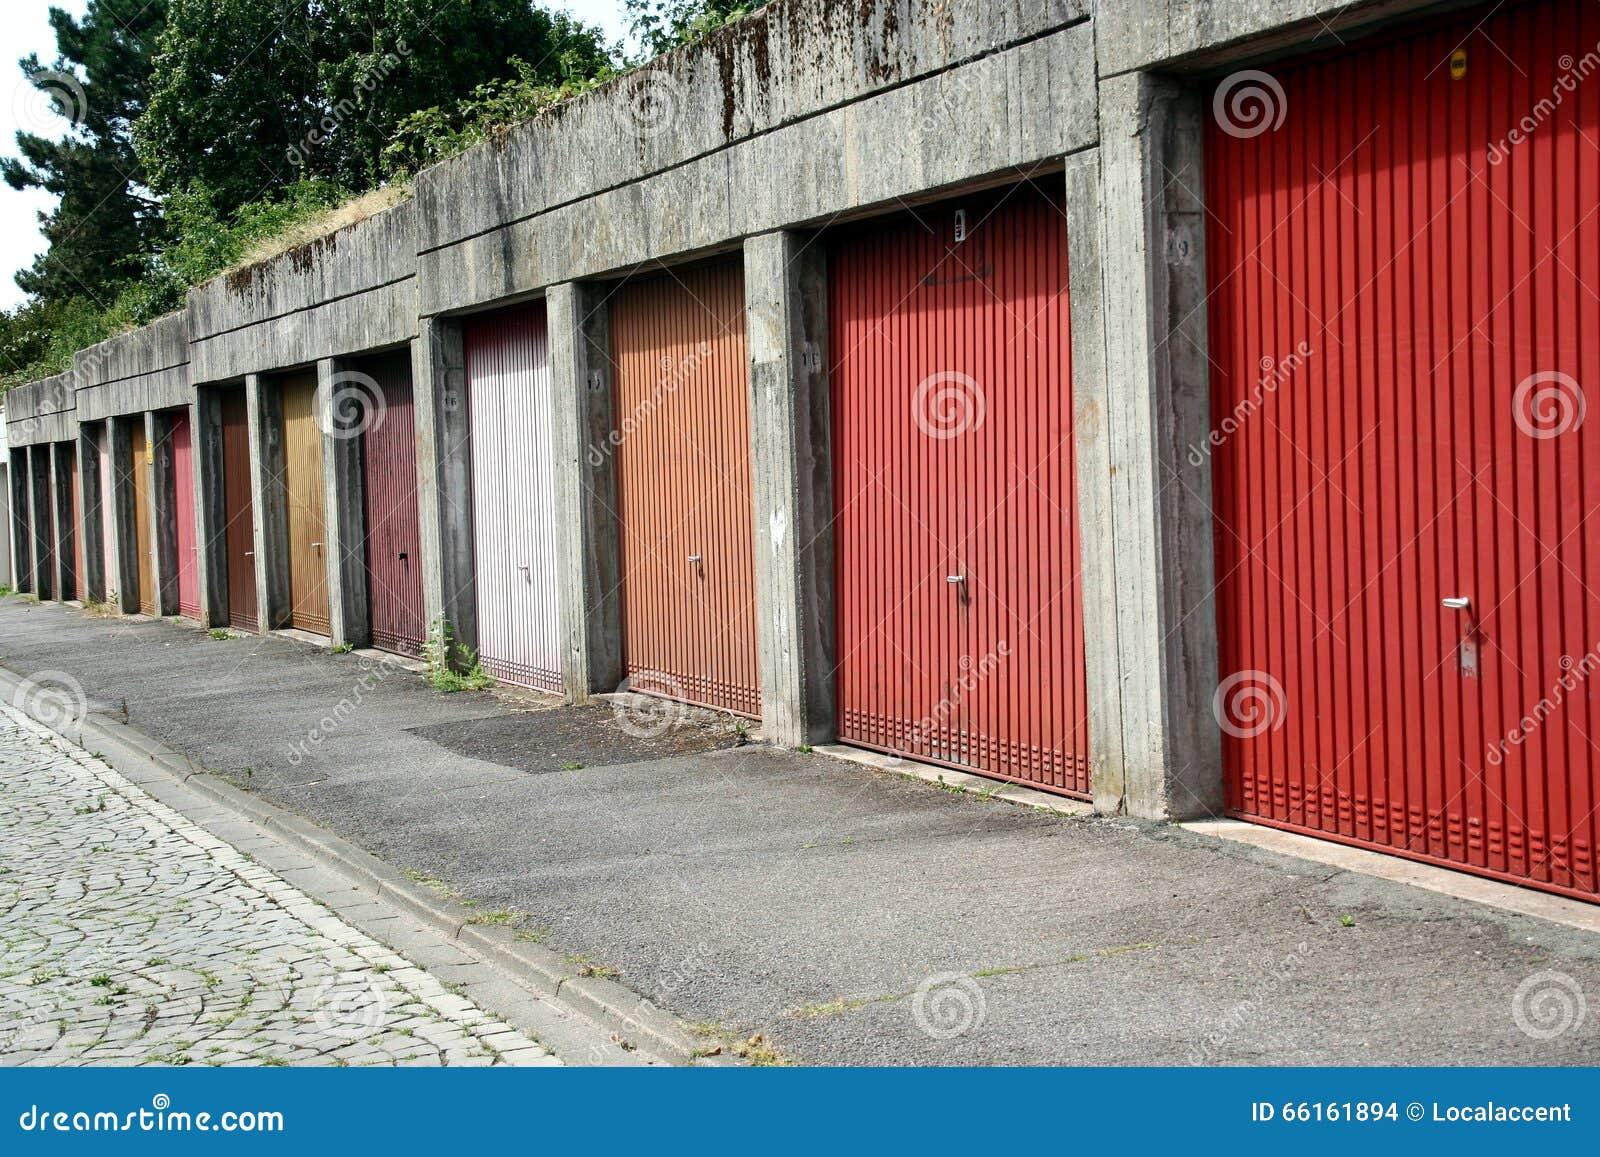 Urban Garage Doors Germany Stock Photo Image Of Orange Manual